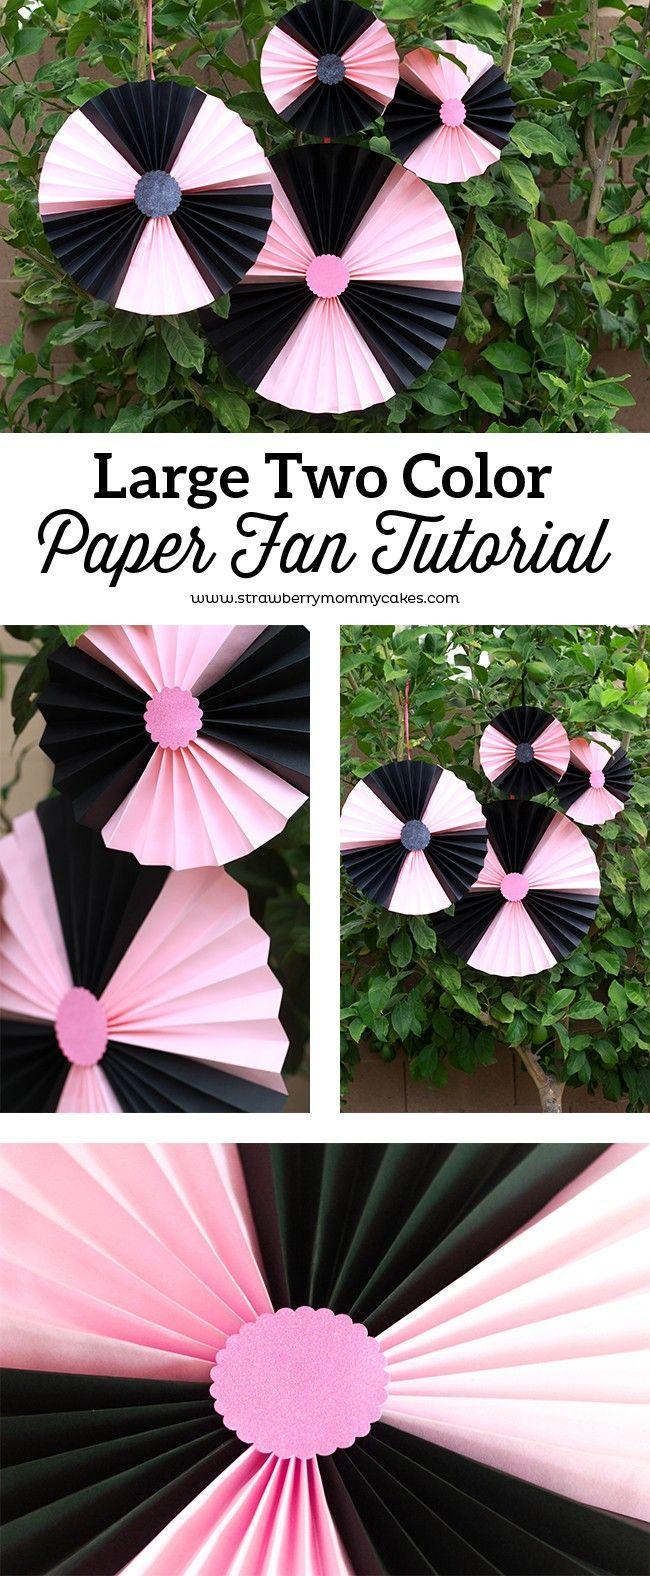 Large two color paper fan tutorial tutorials